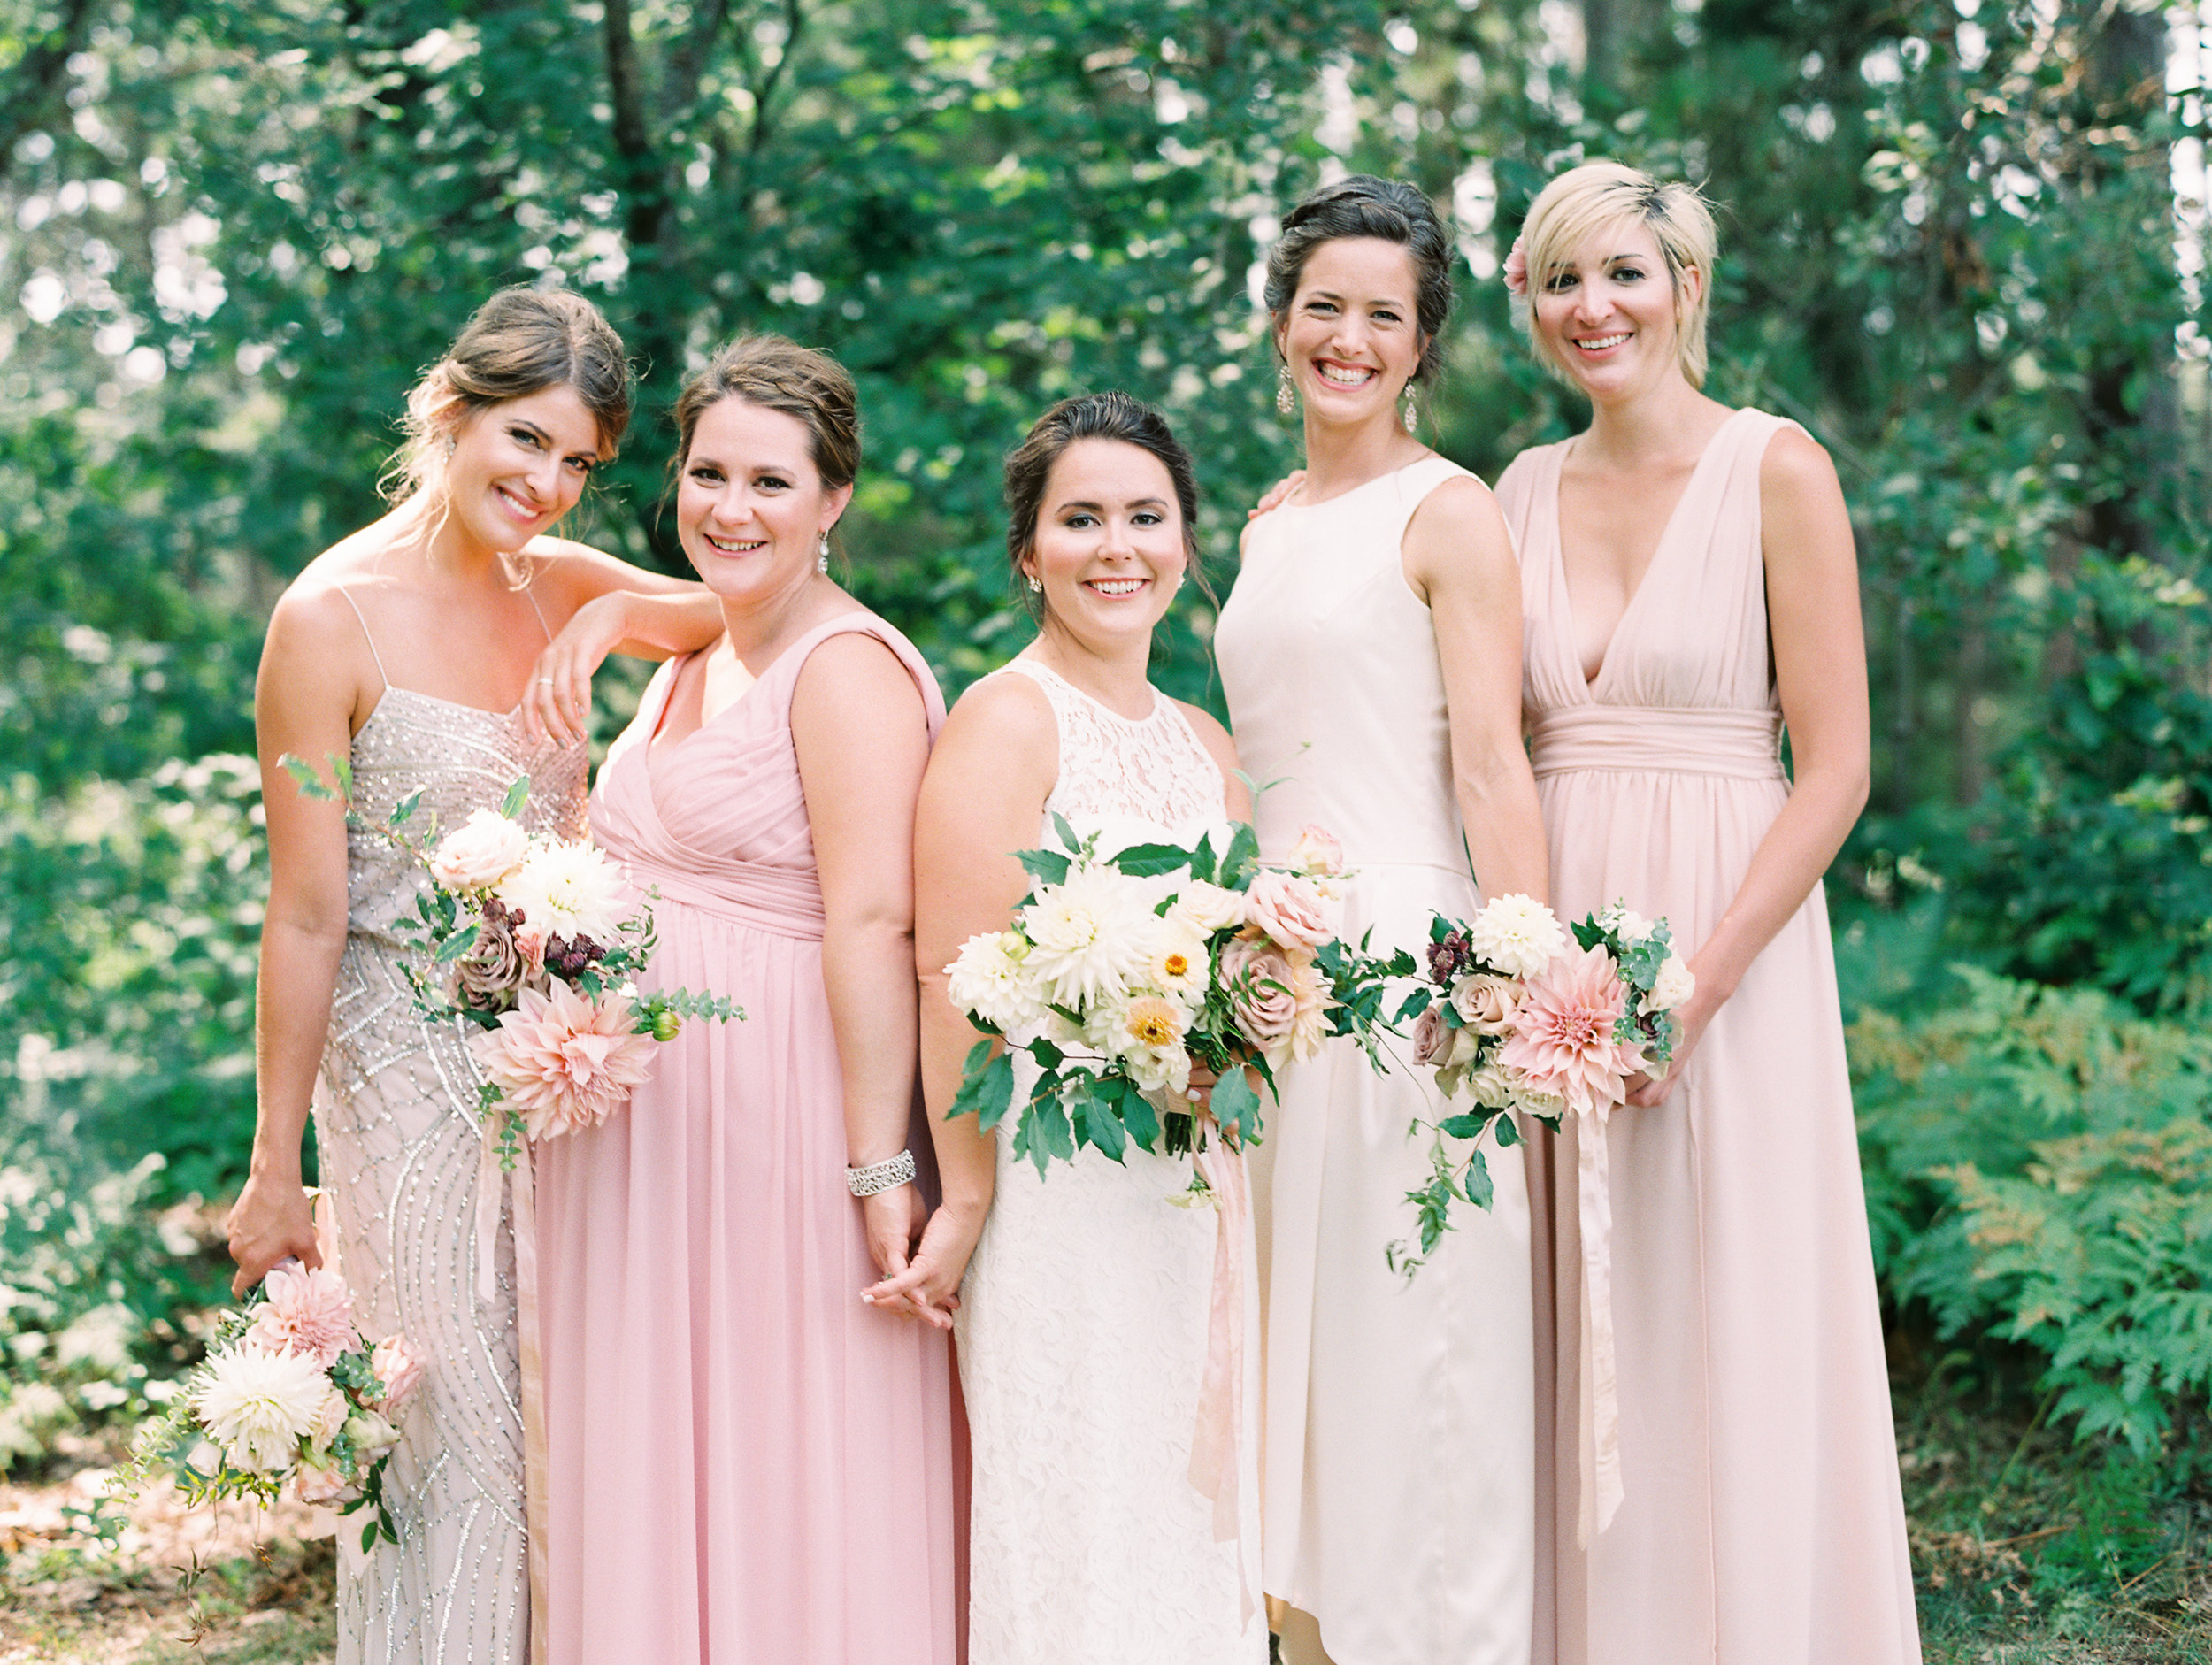 Zoller+Wedding+Bridal+Partyf-98.jpg